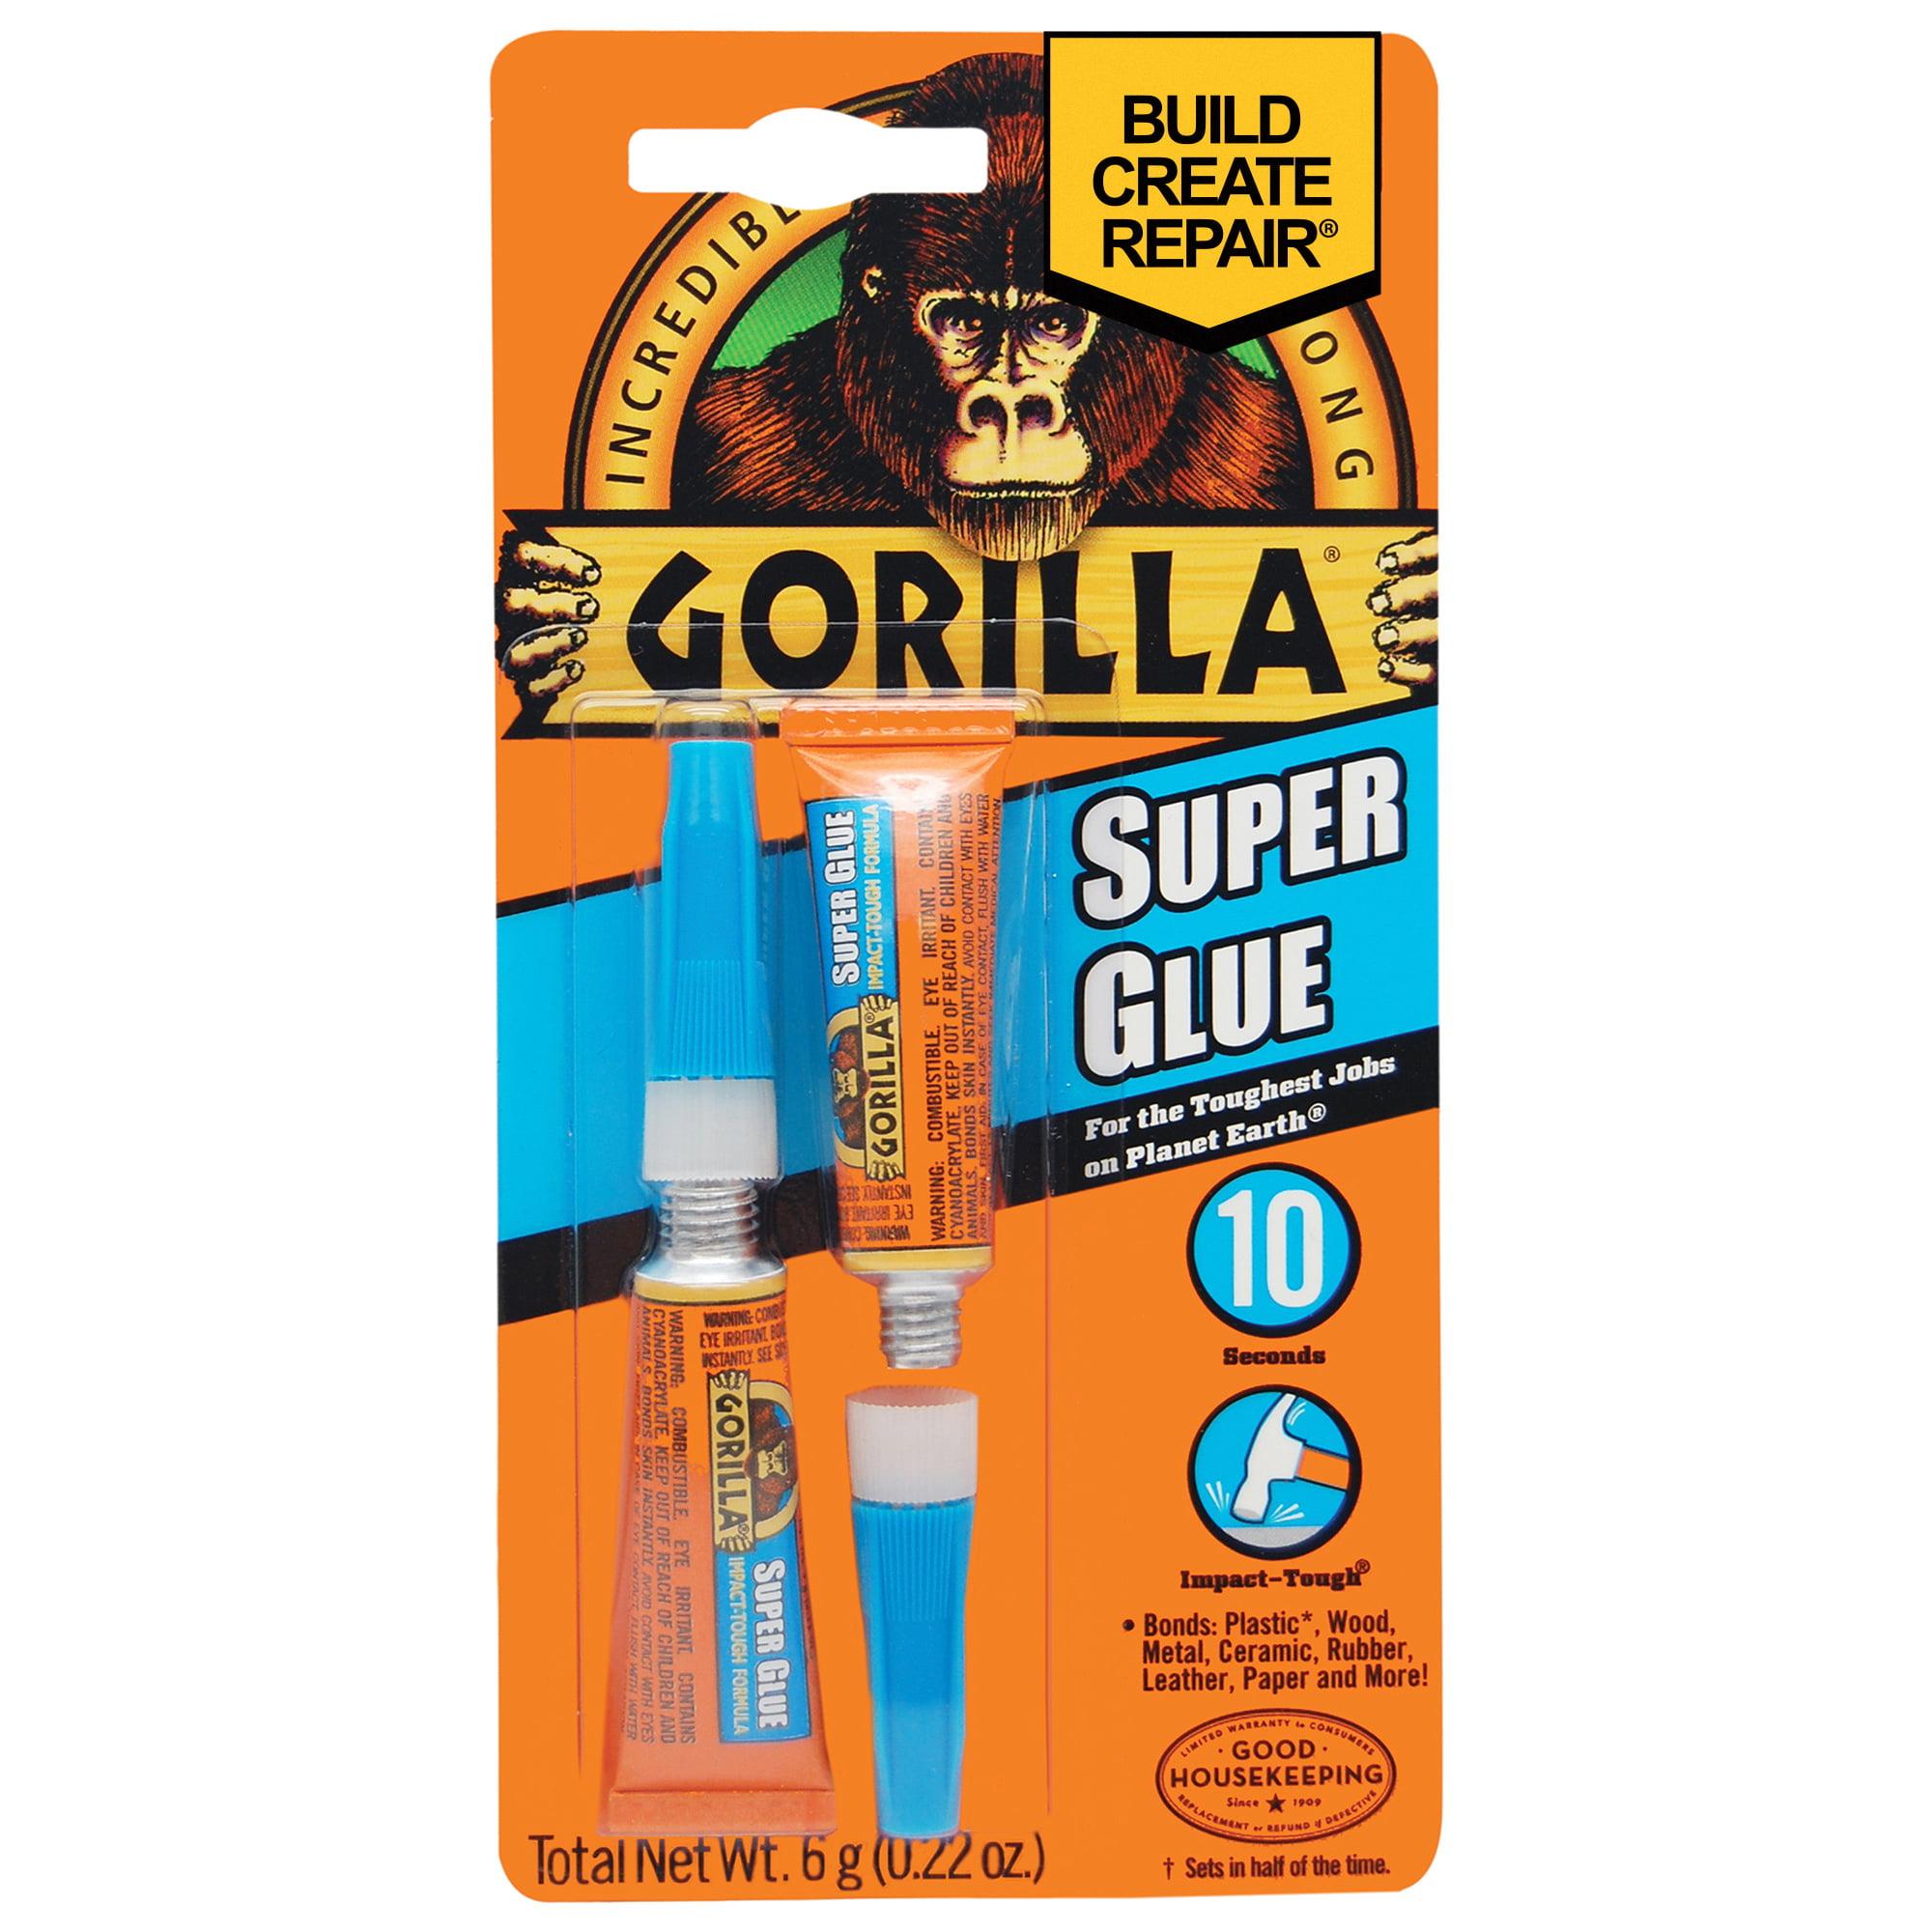 Gorilla Super Glue, 3g